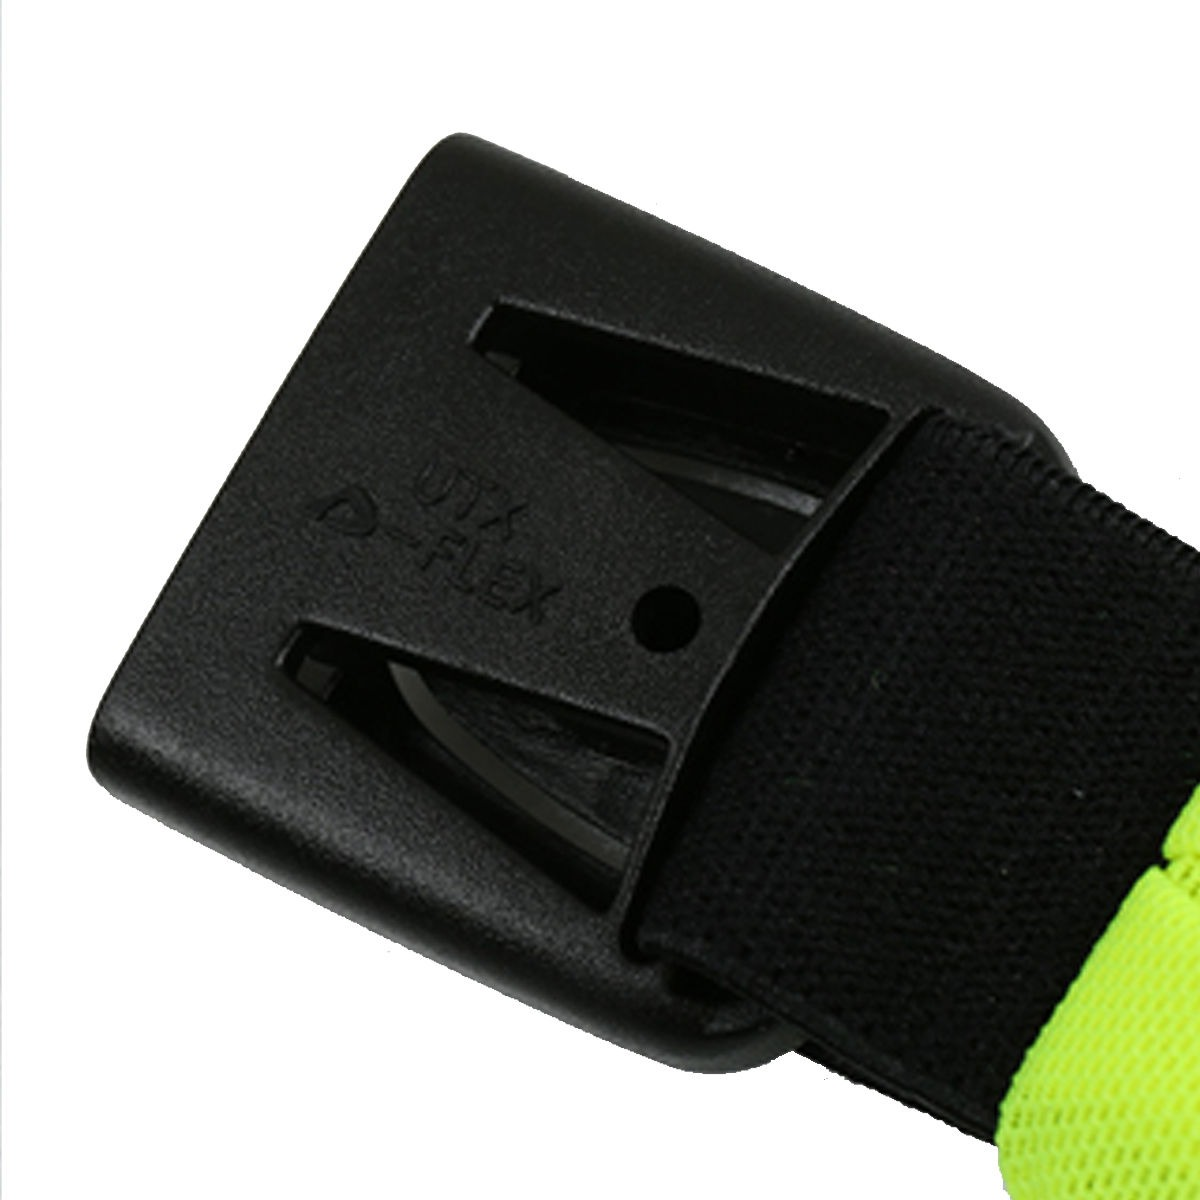 best website 11da1 fce5a Pochete Nike Expandable Running Lean Waistpack - R  135,76 em Mercado Livre